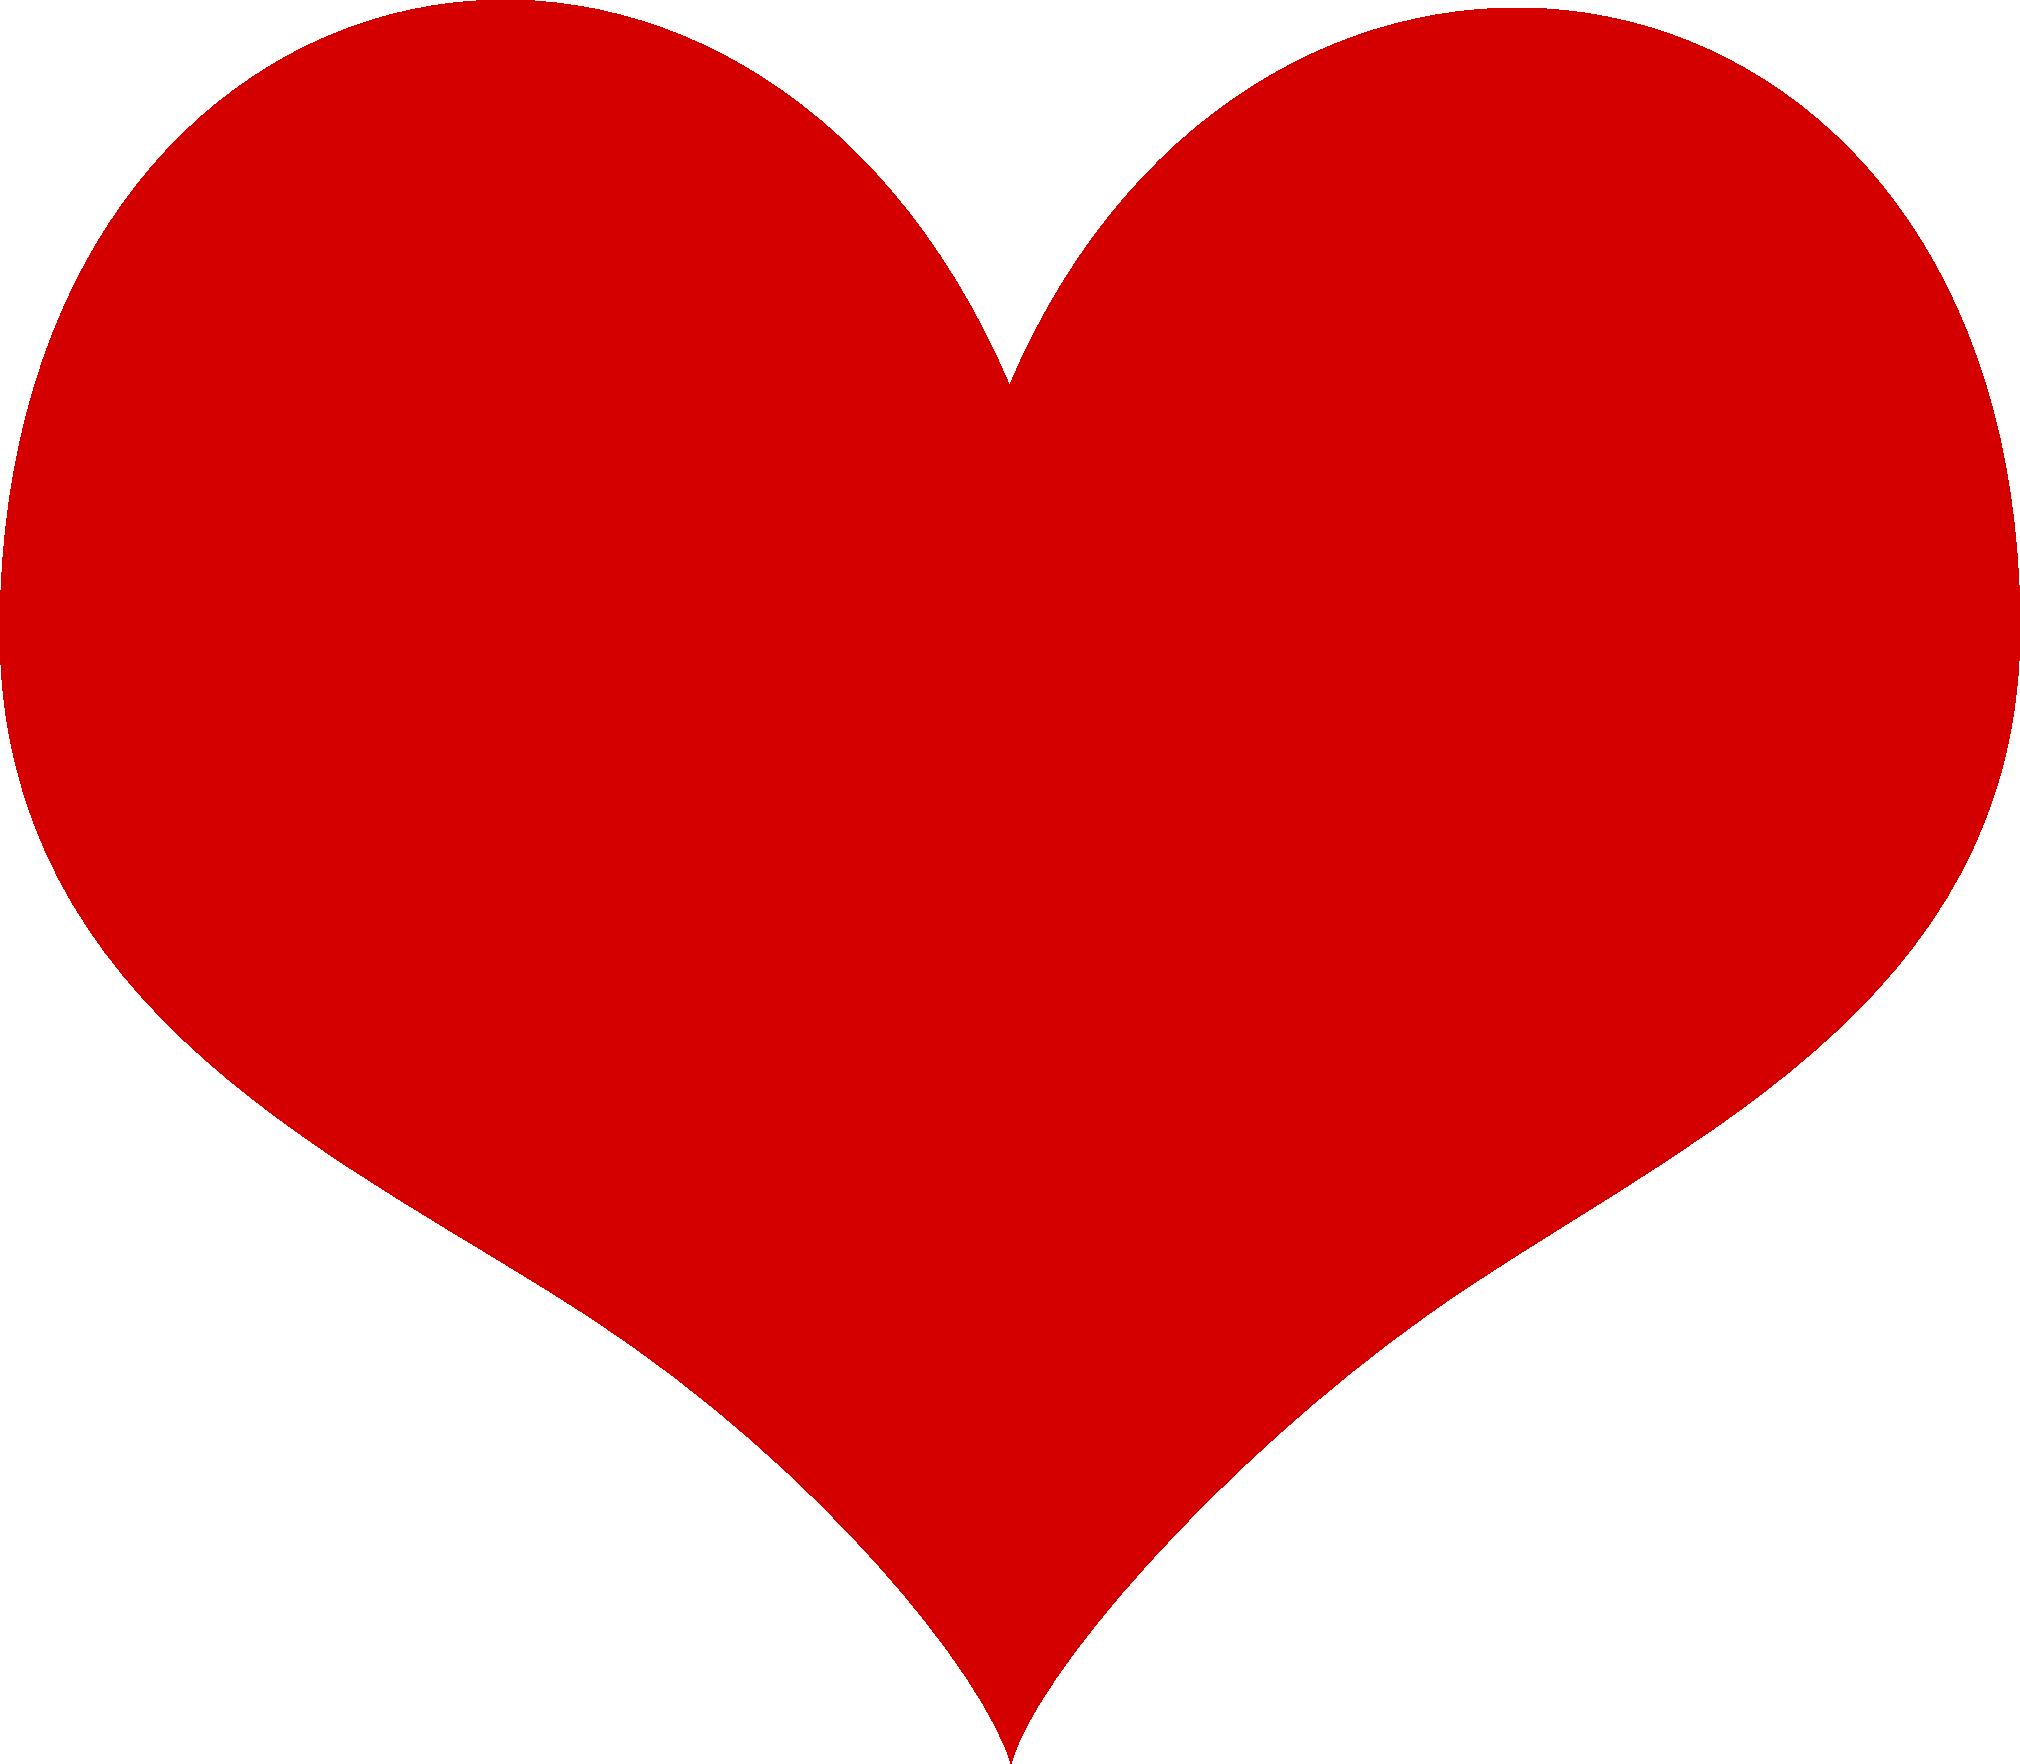 Cute Heart Shape Heart Clip Art Valentine Heart Pictures Valentine Heart Images